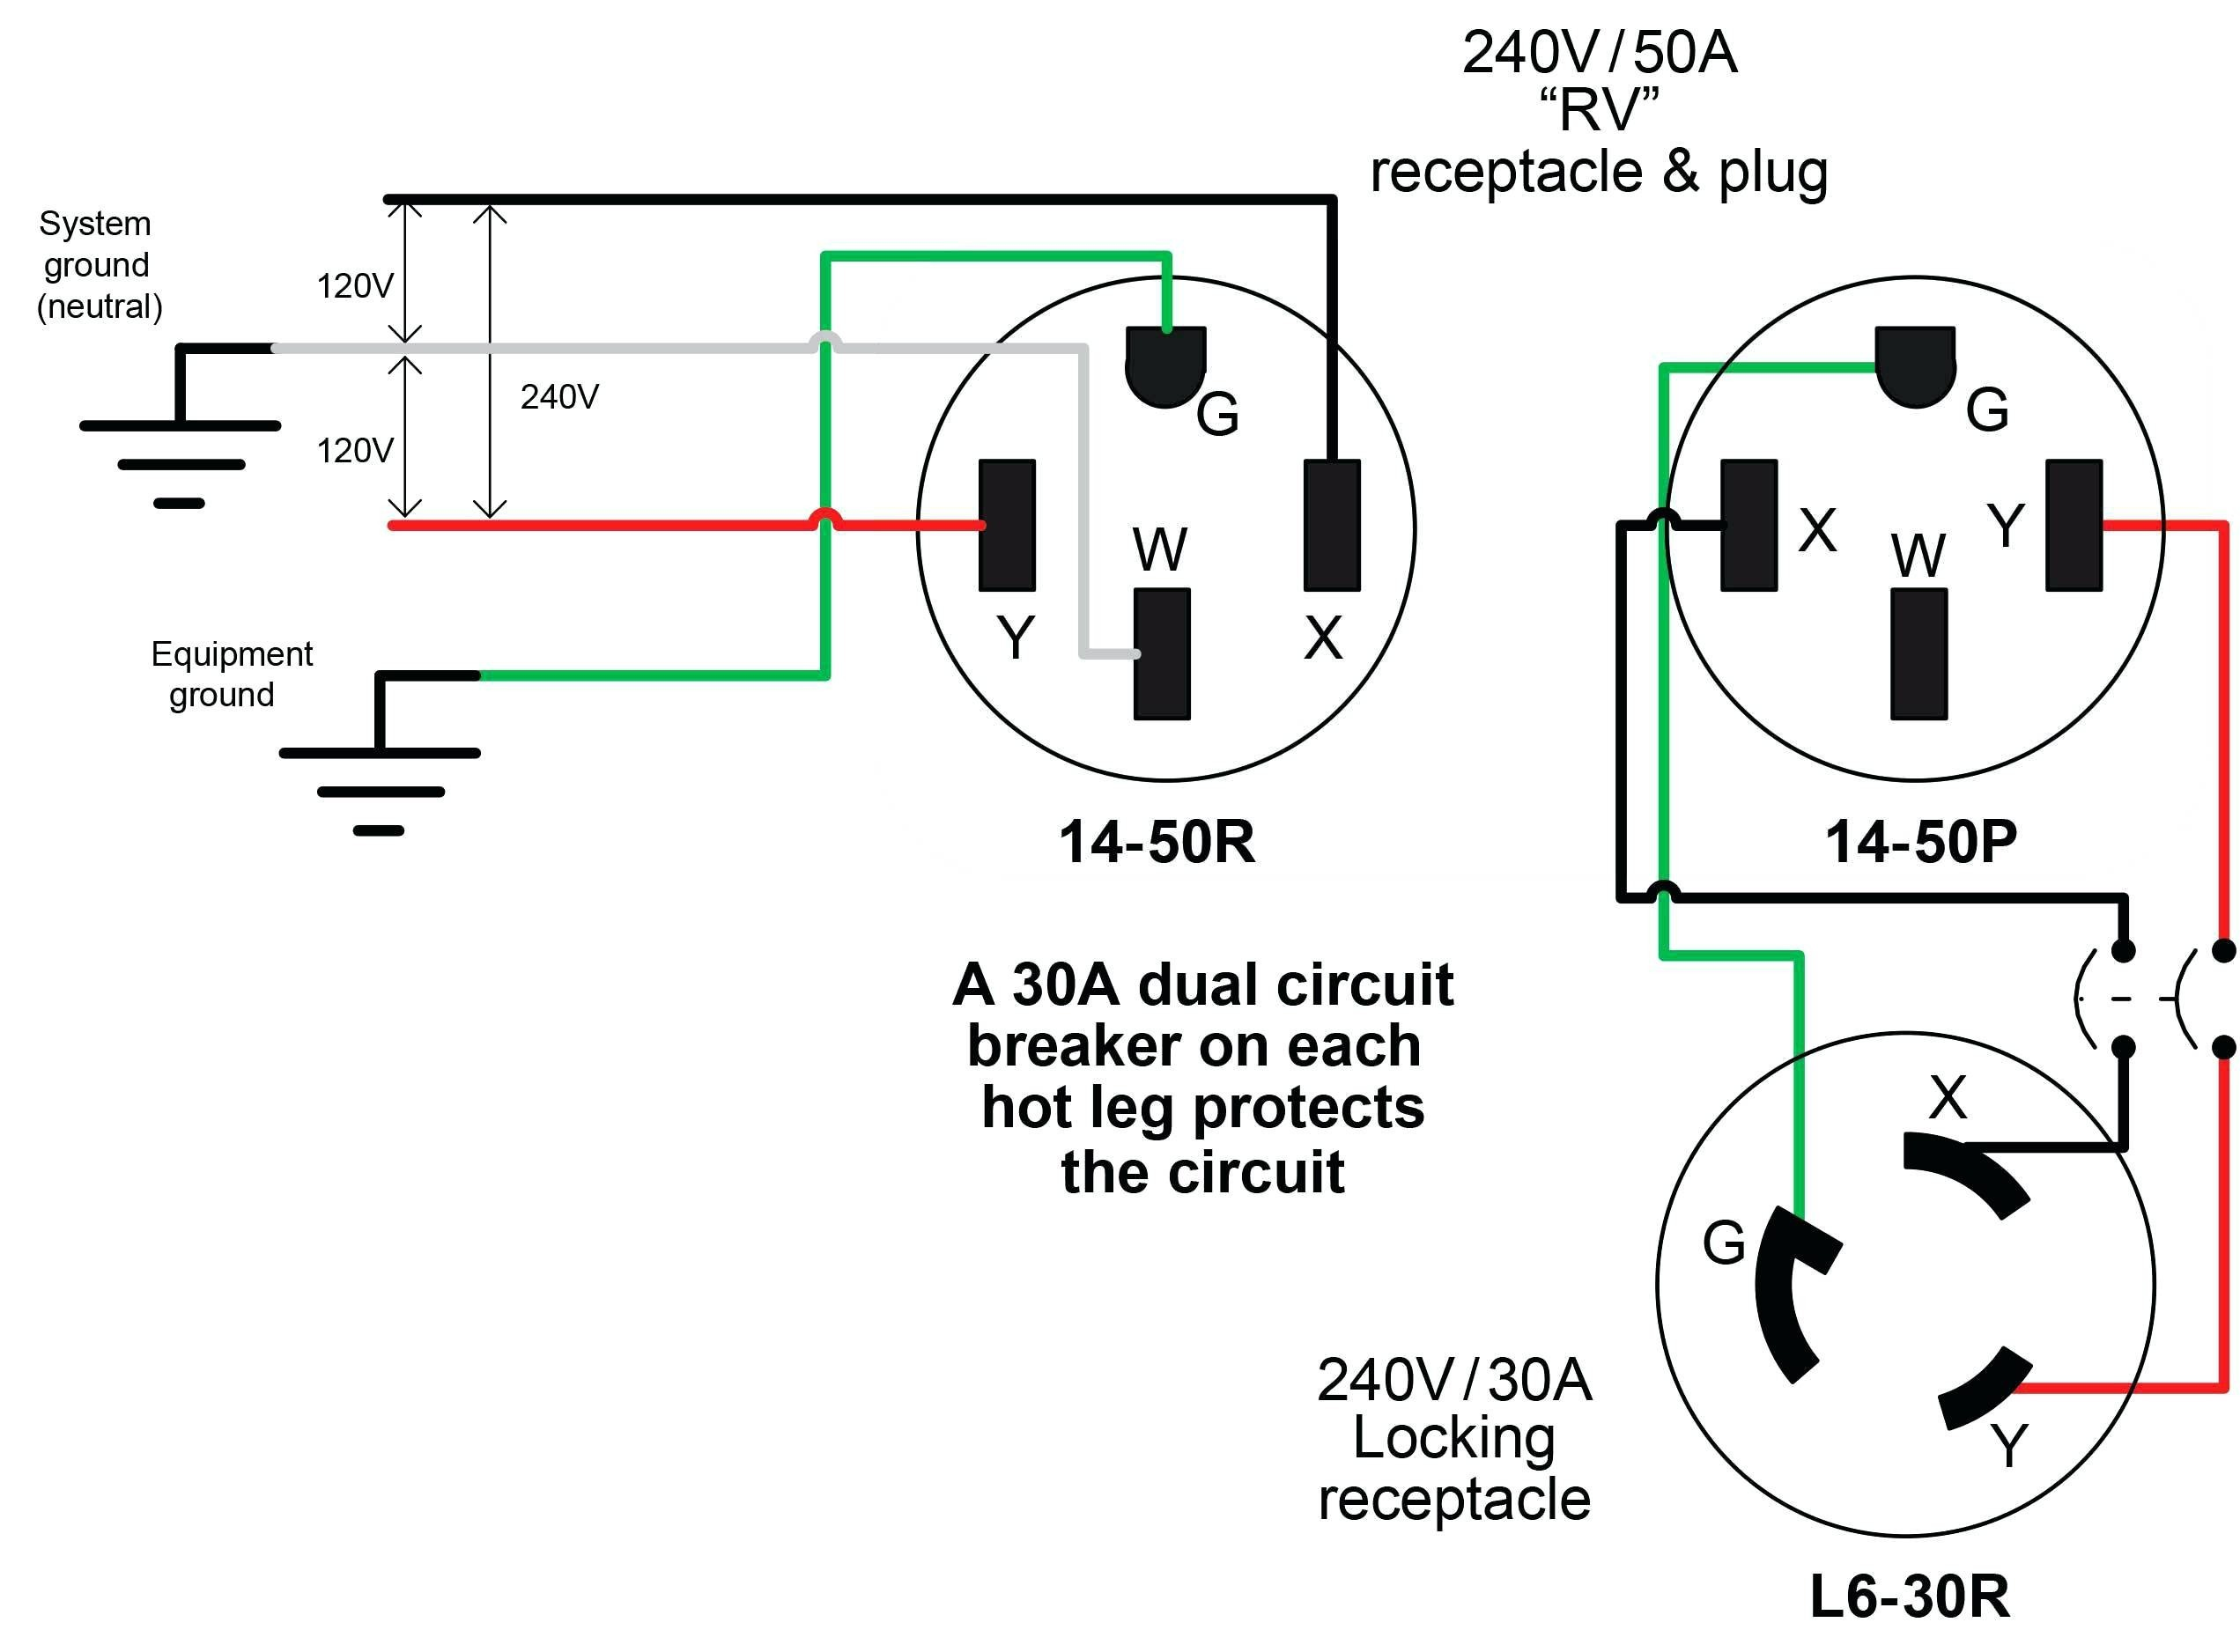 50 Amp Rv Plug Wiring Diagram Inspirationa Wiring Diagram 50 Amp Plug Of 50 Amp Rv Plug Wiring Diagram